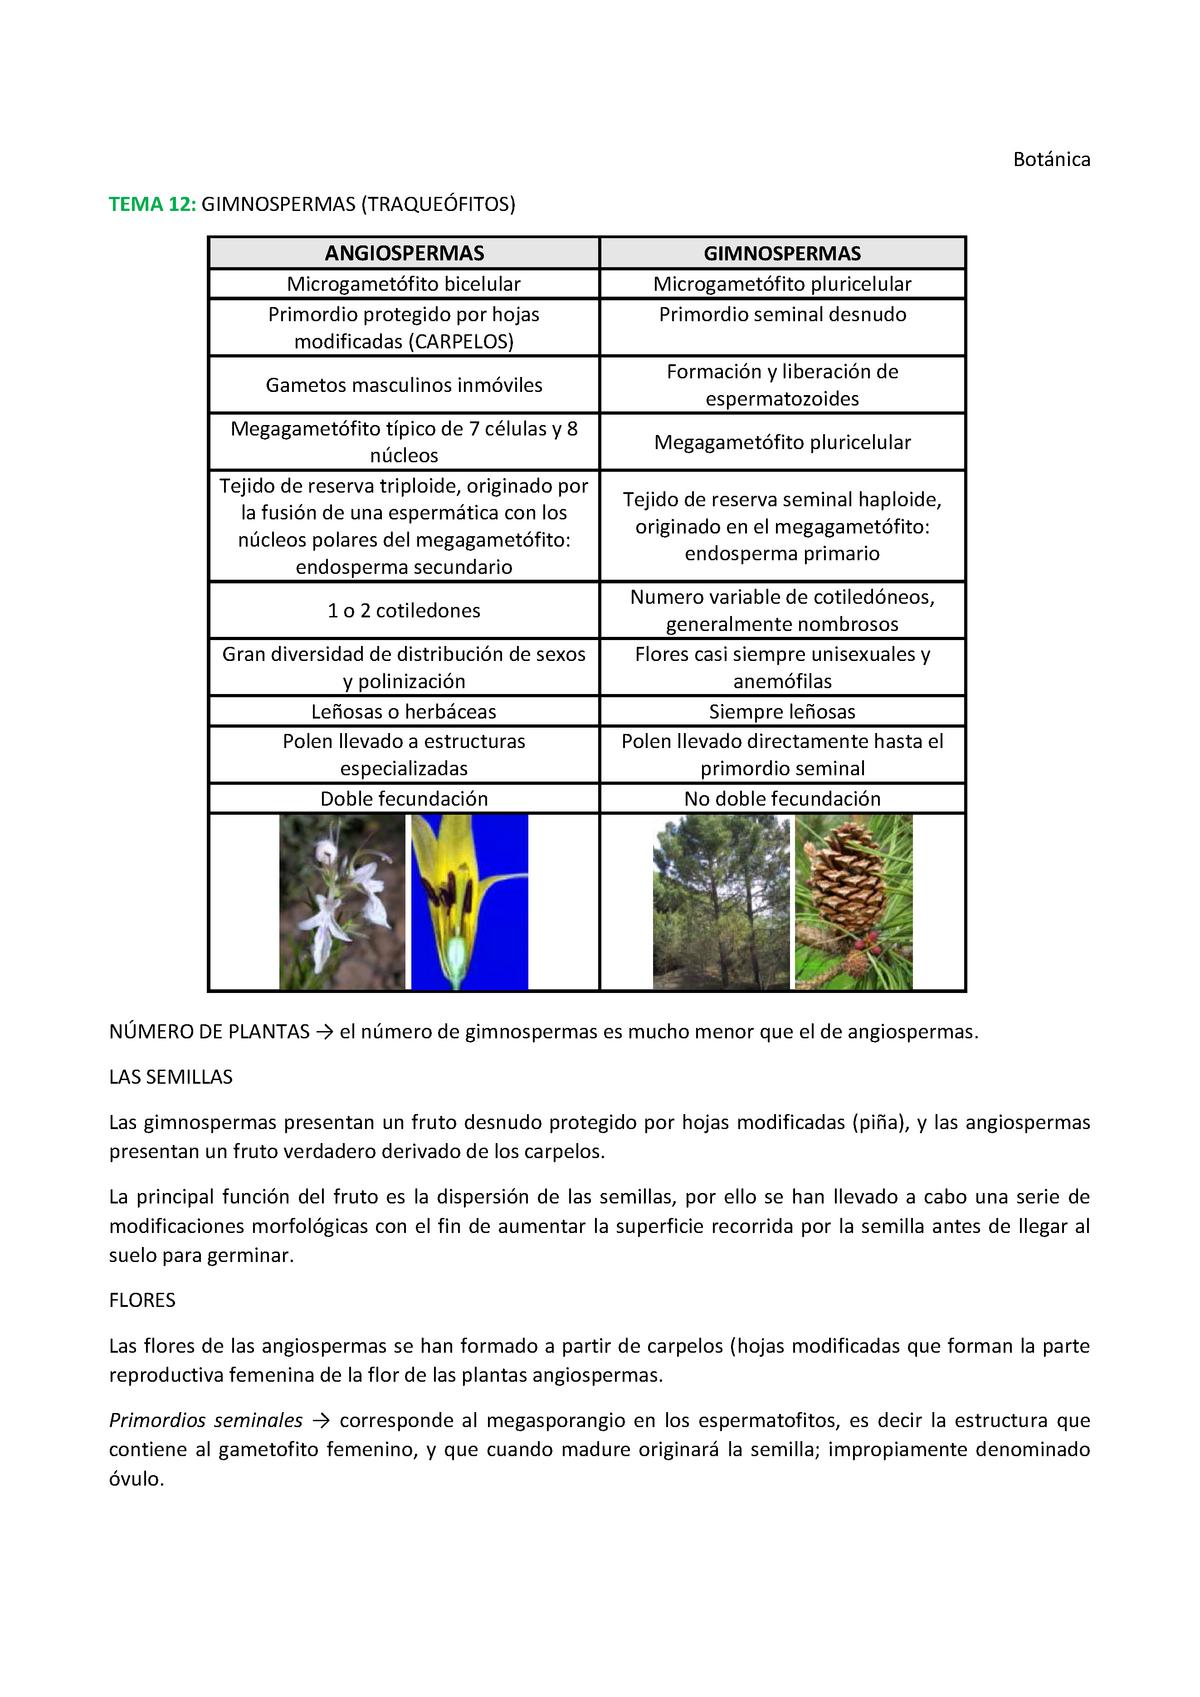 TEMA 12Gimnospermas - Botànica - StuDocu